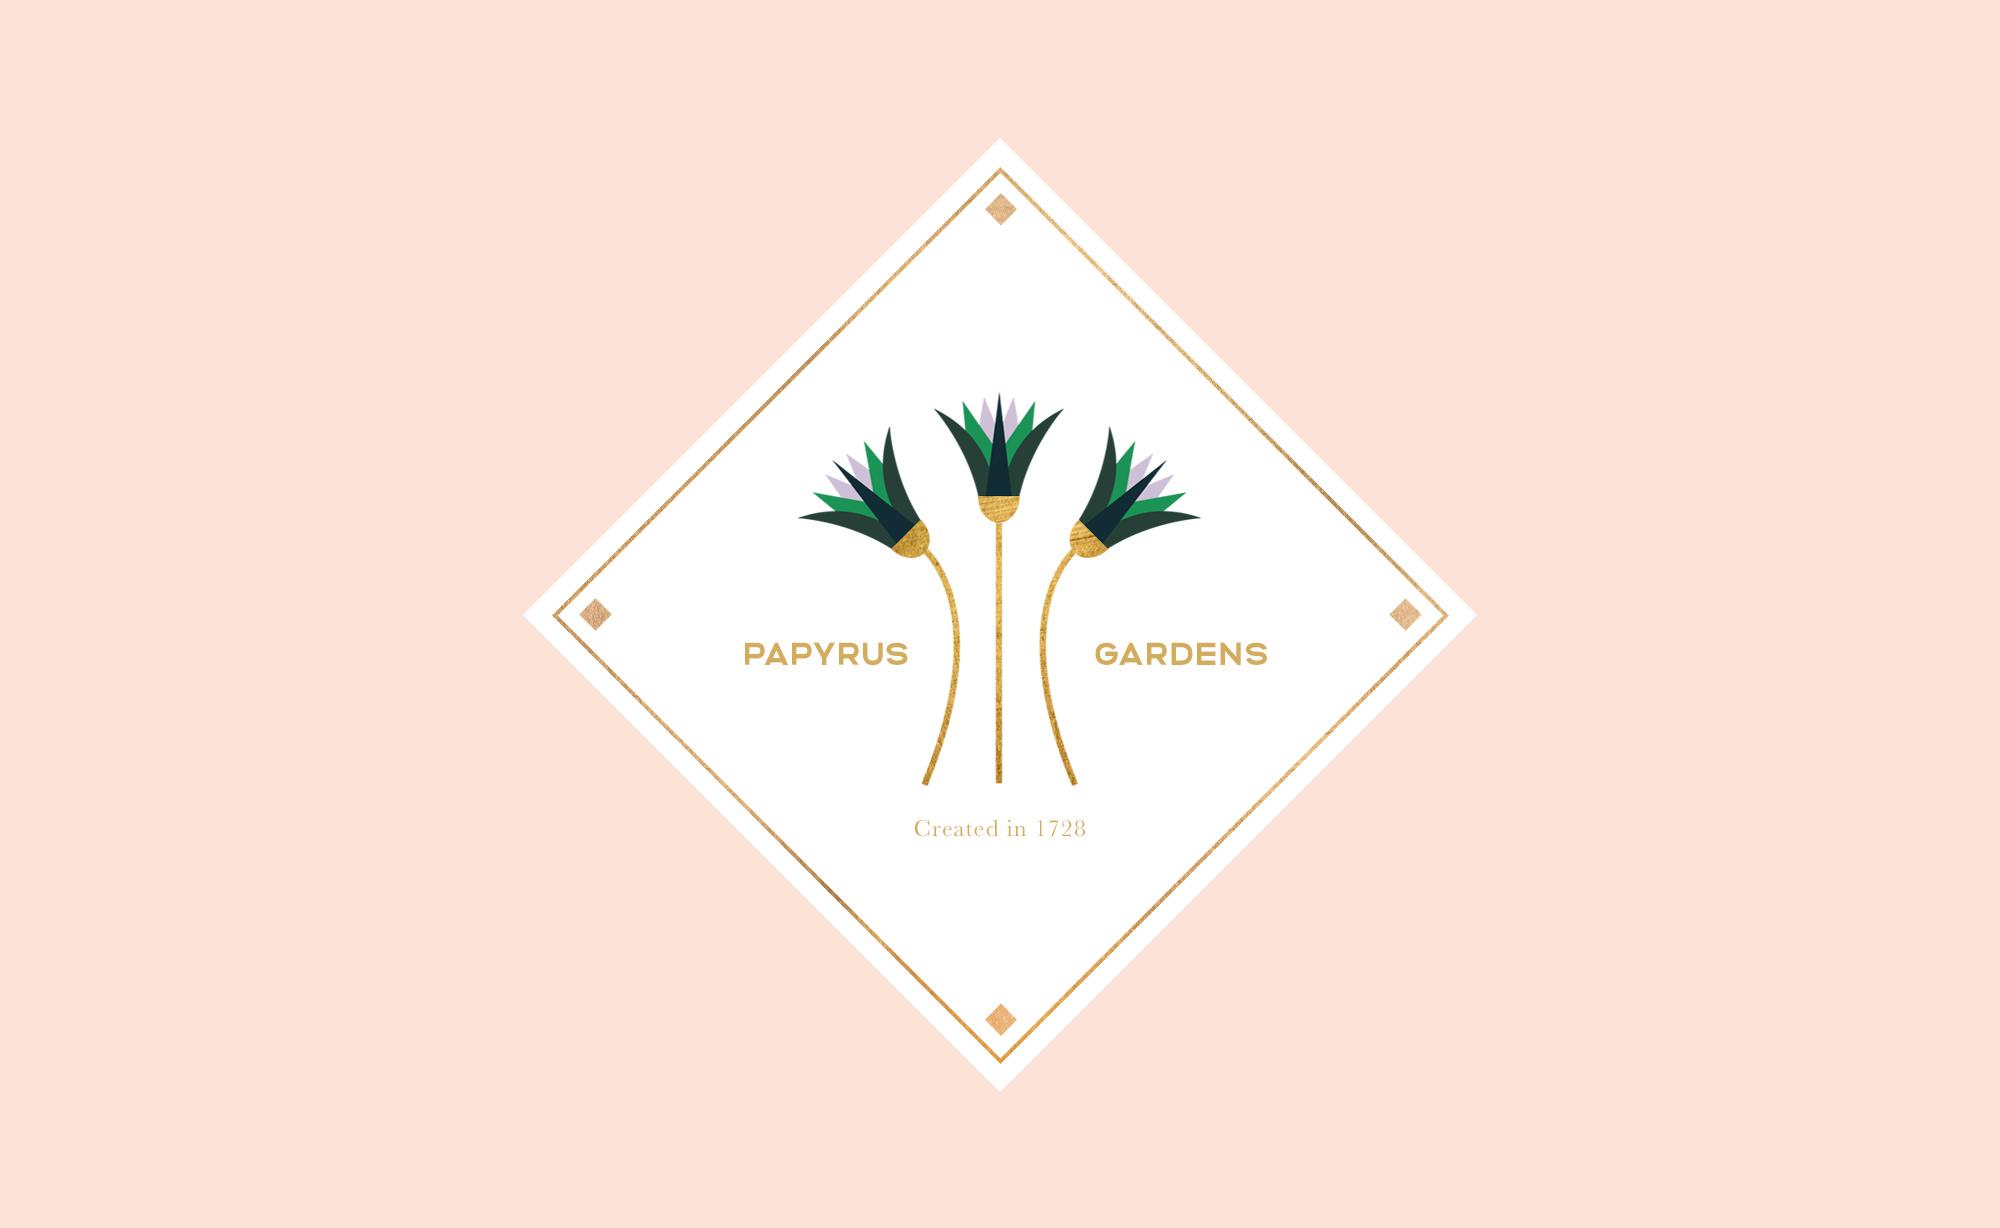 Papyrus Garden